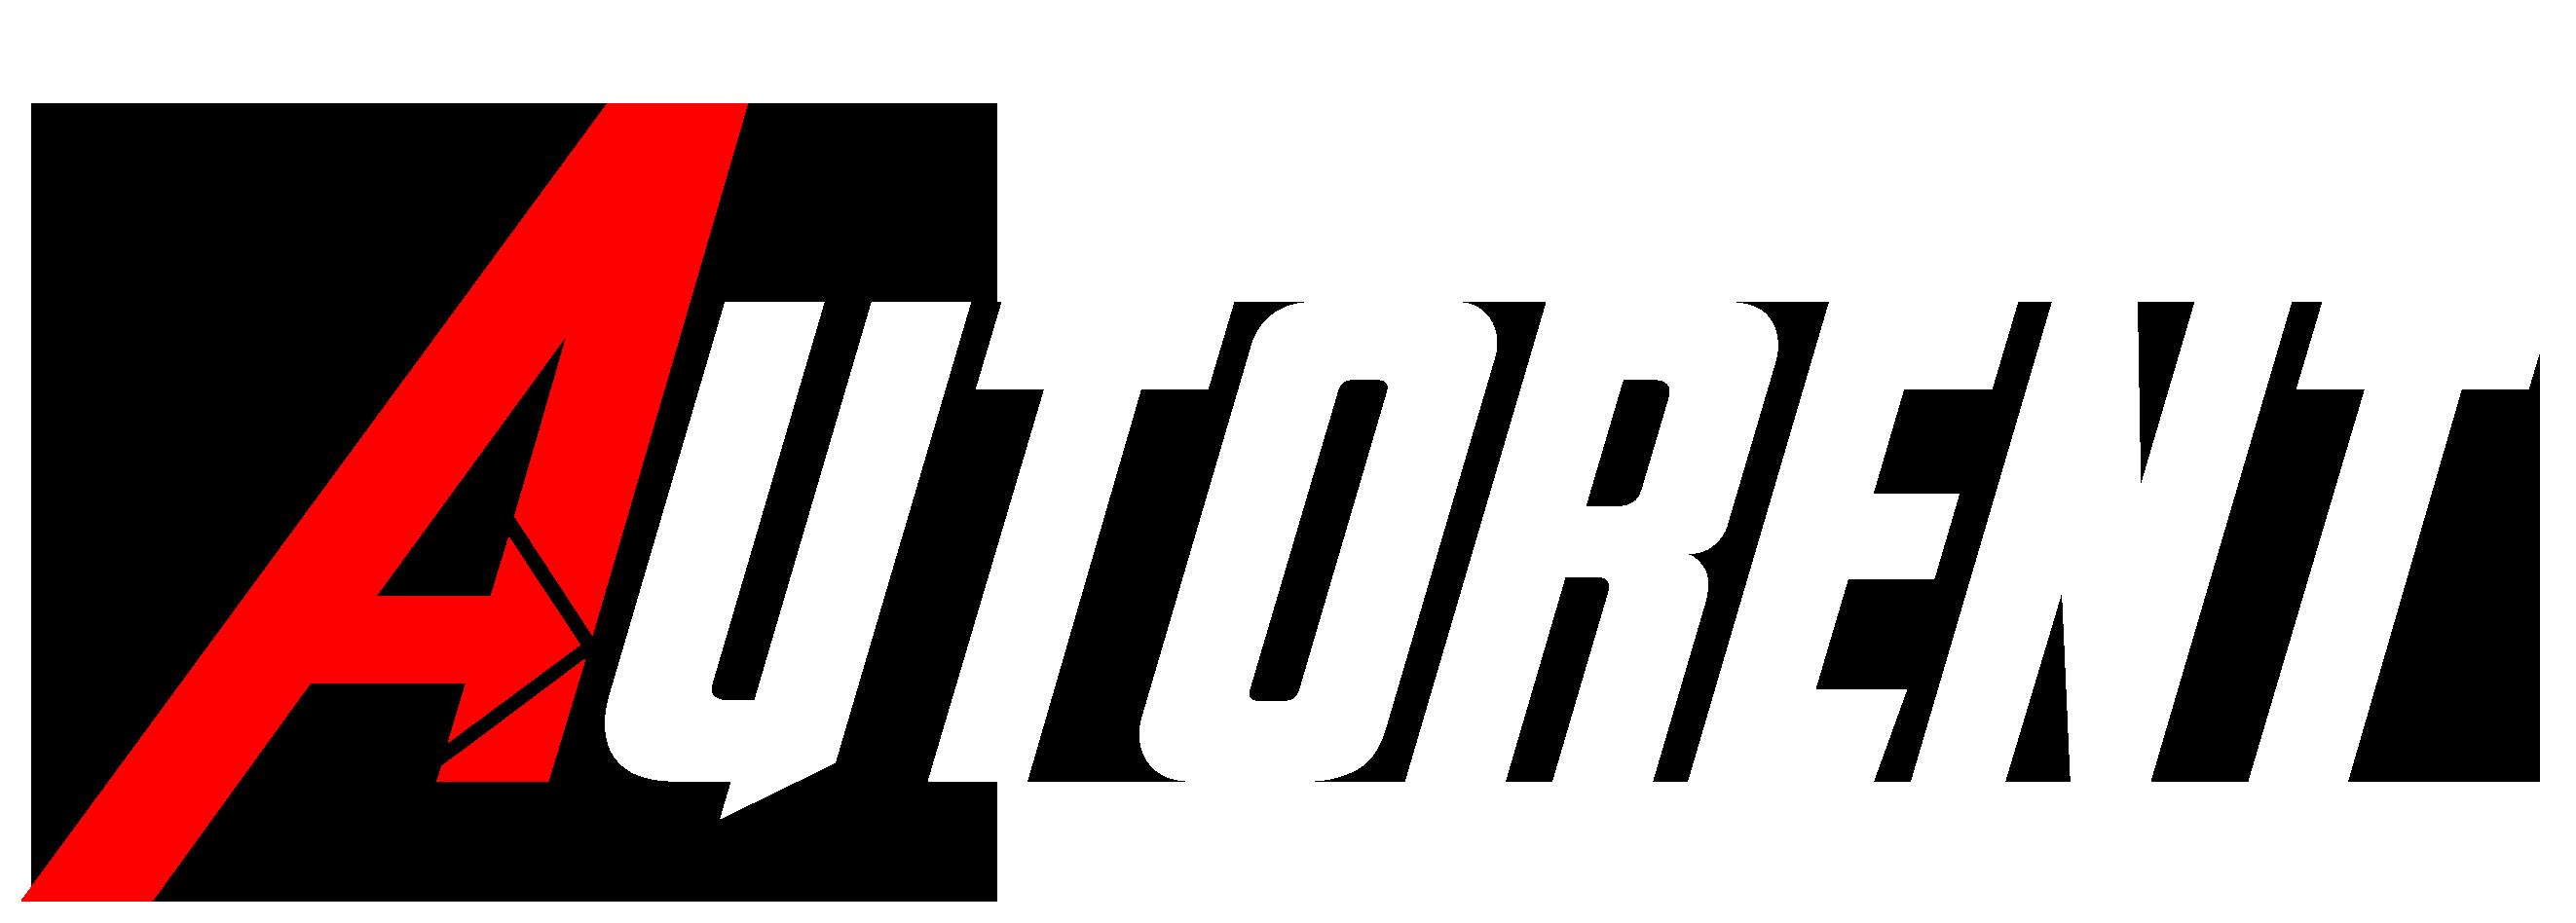 Keila Autorent